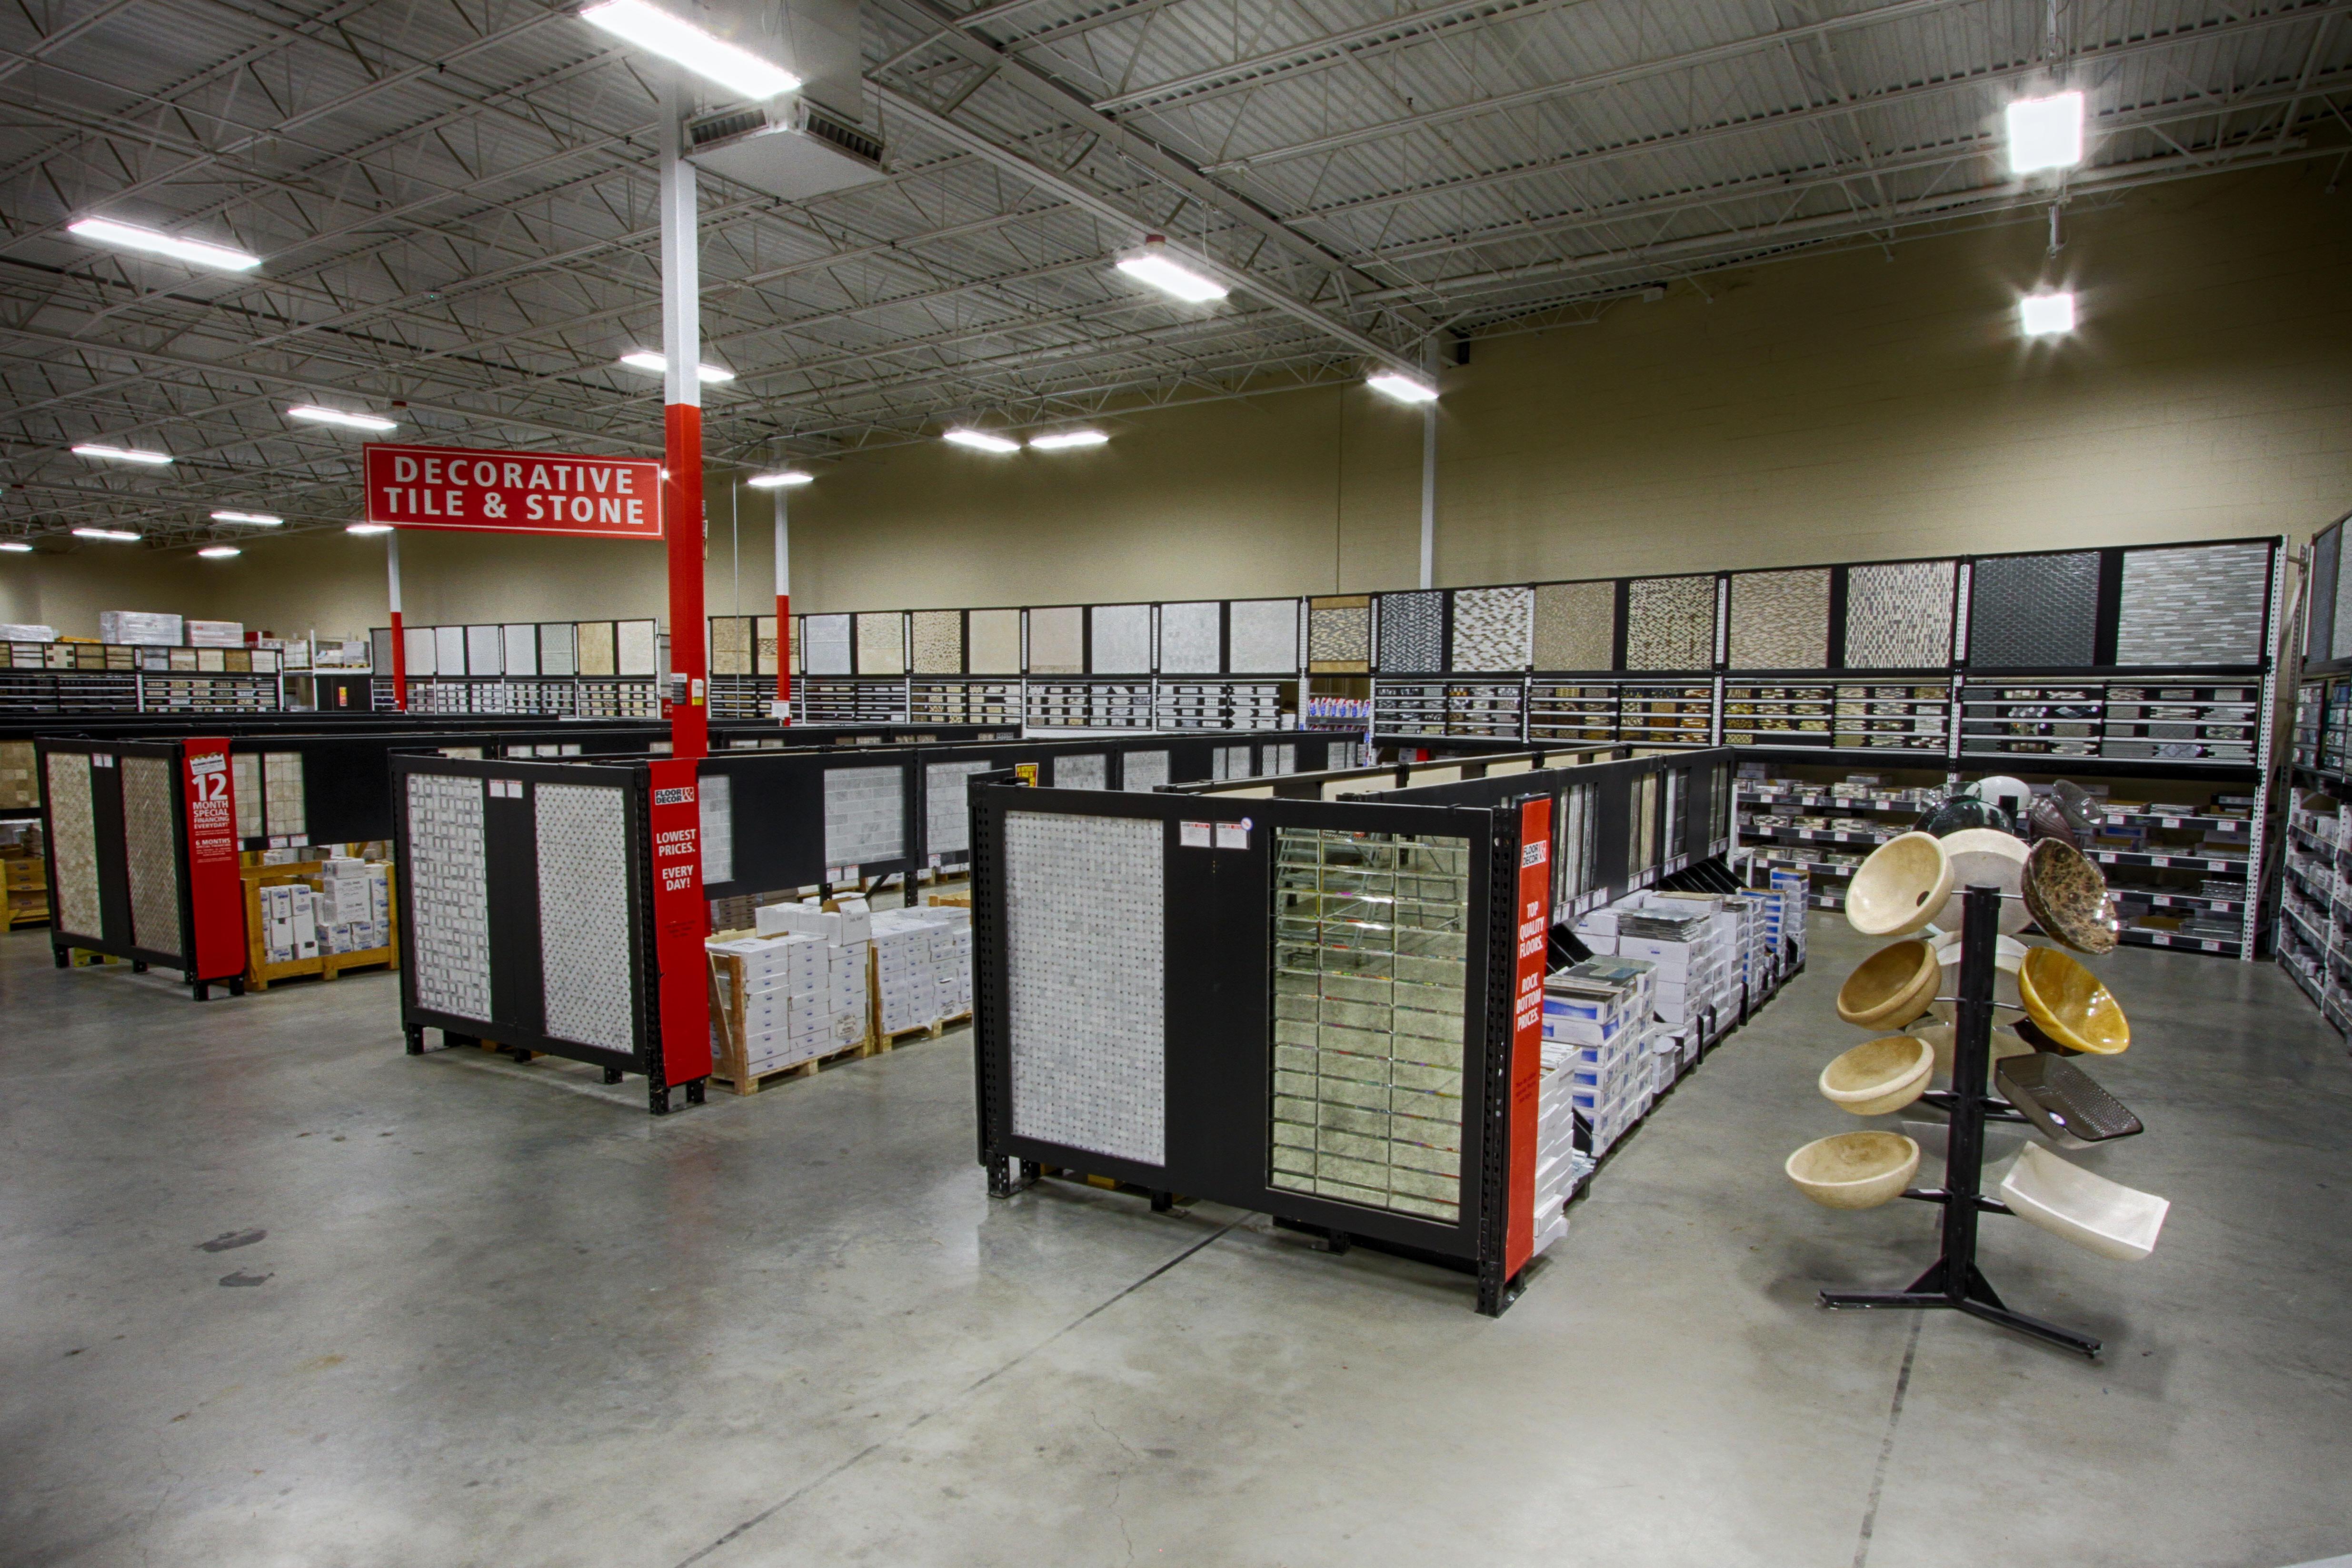 floor amp decor in gretna la 70053 chamberofcommerce com floor amp decor in gretna la 70053 chamberofcommerce com